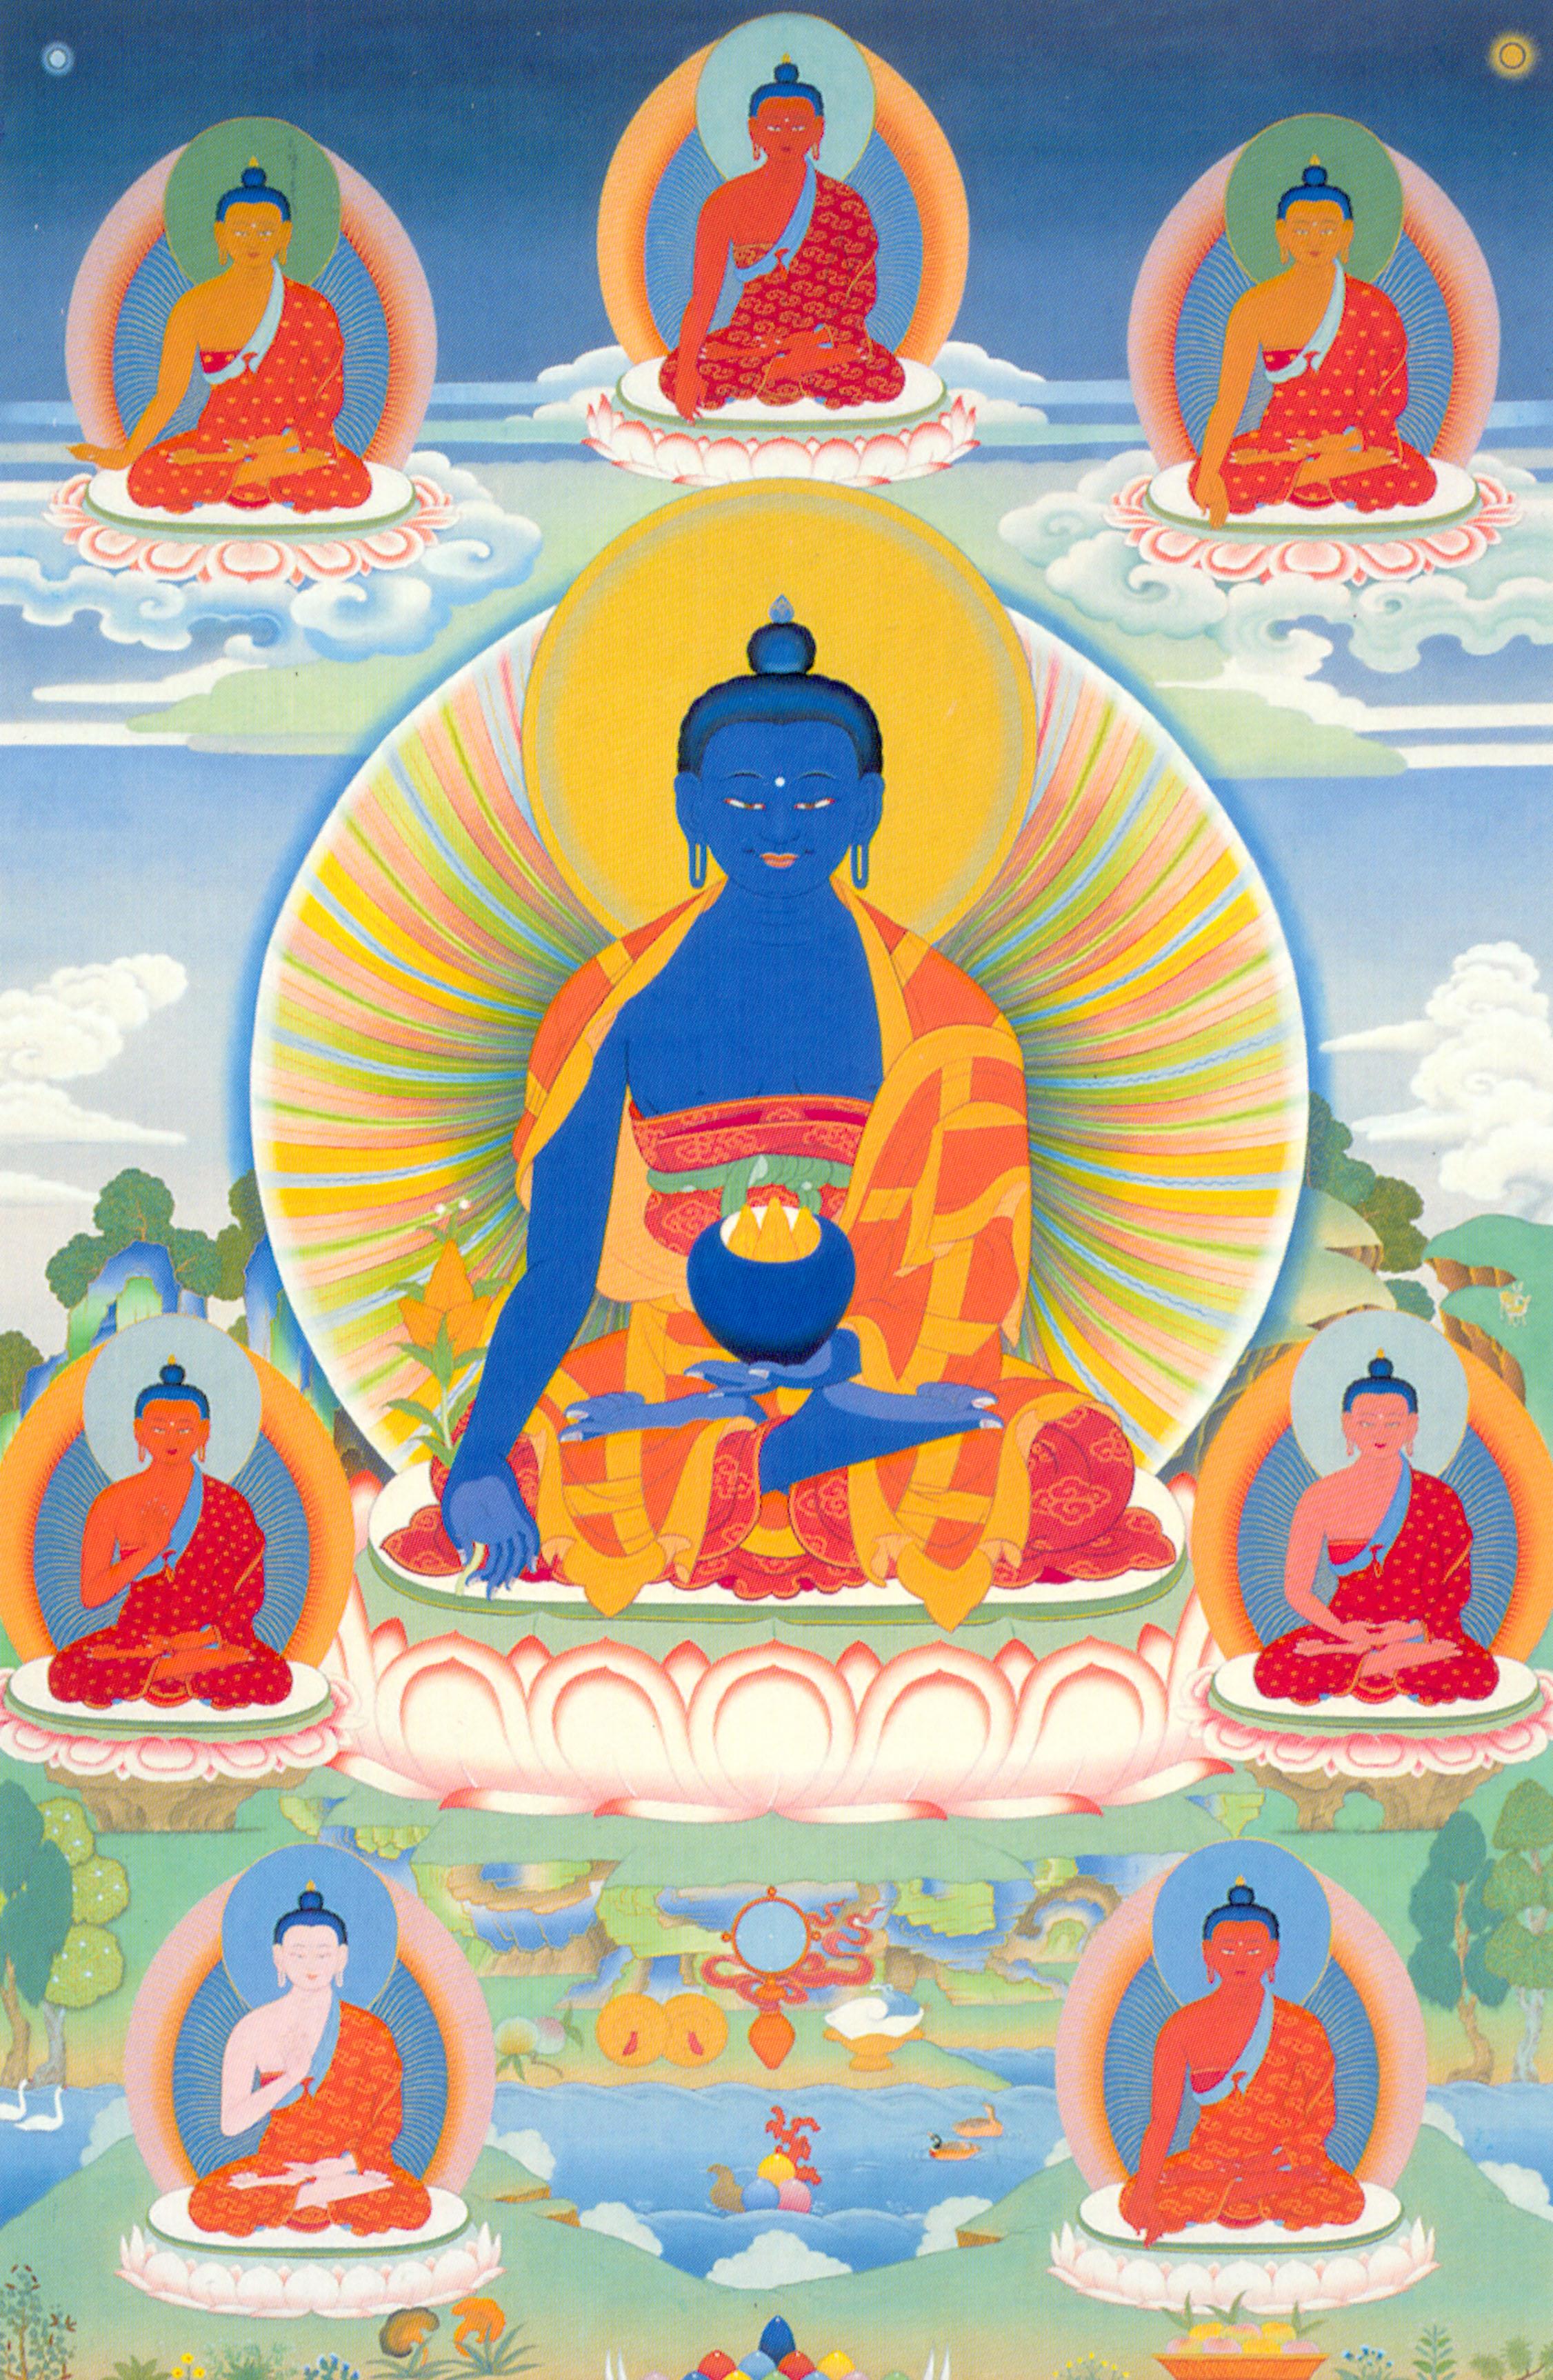 Lama Zopa Rinpoche's Advice for Medicine Buddha Mantra and ...